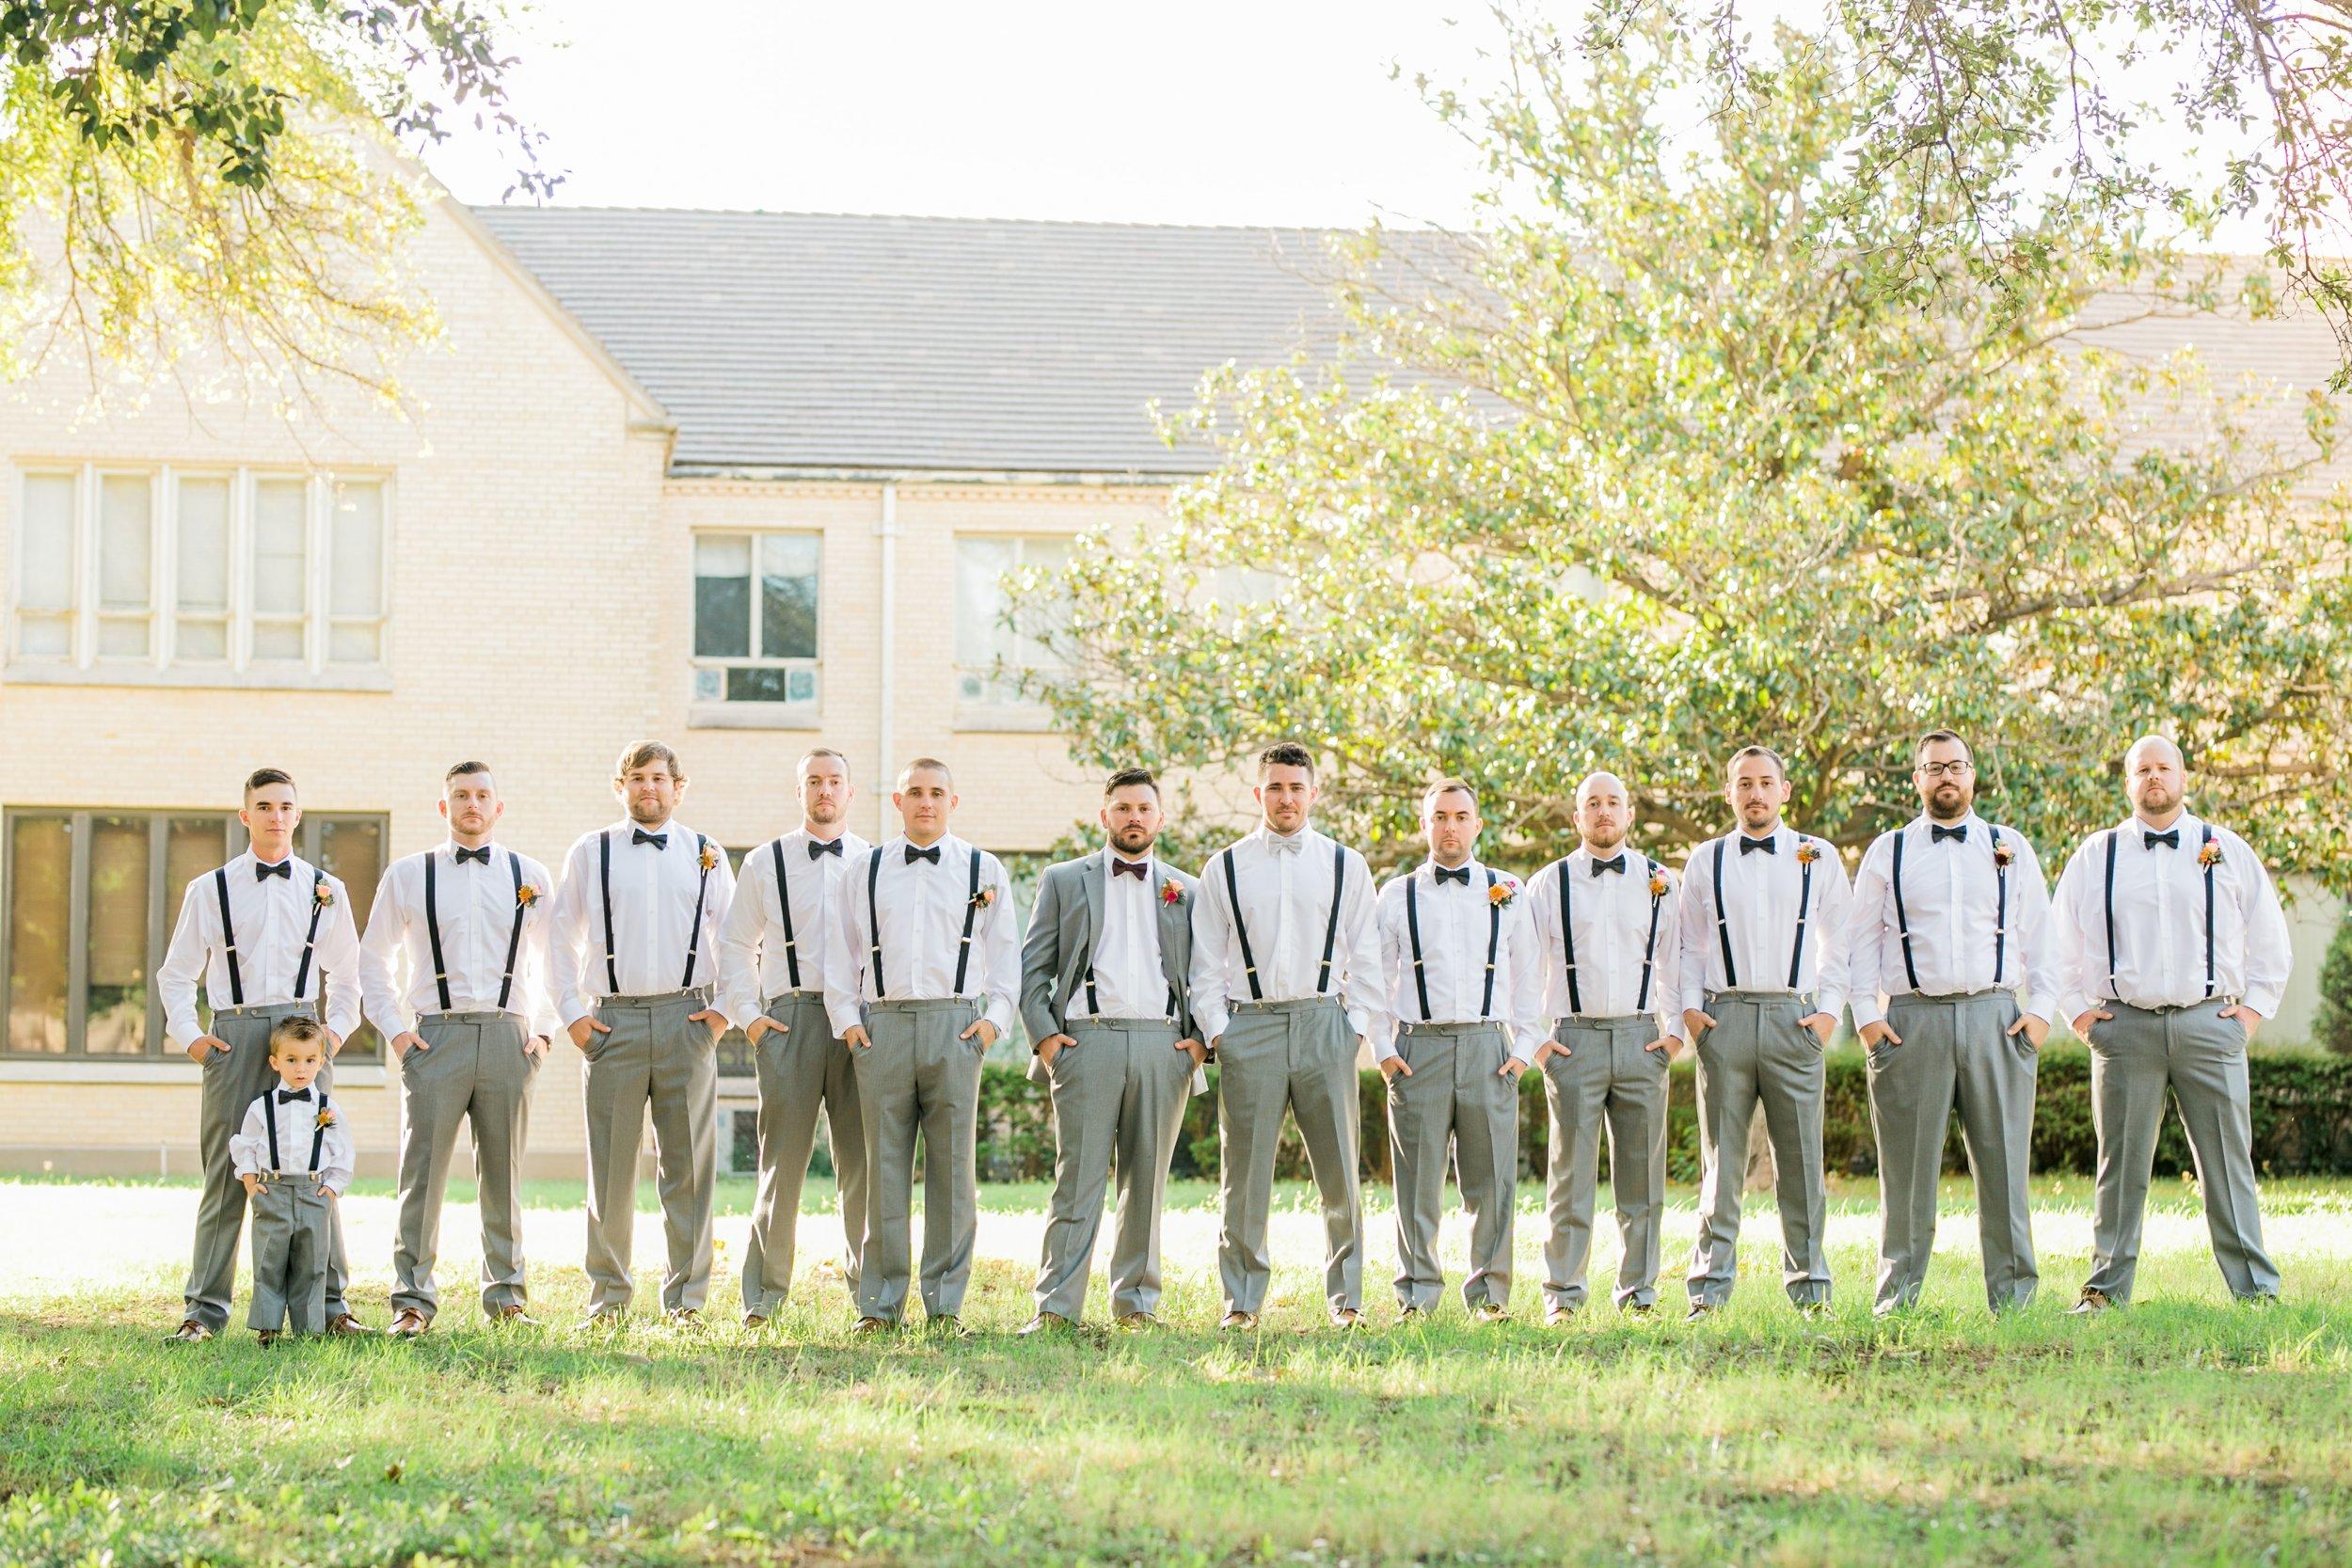 Roberson-Wedding-The-Forum-Lauren-Pinson-Wedding-Photography-Wichita-Falls-Texas-050.jpg